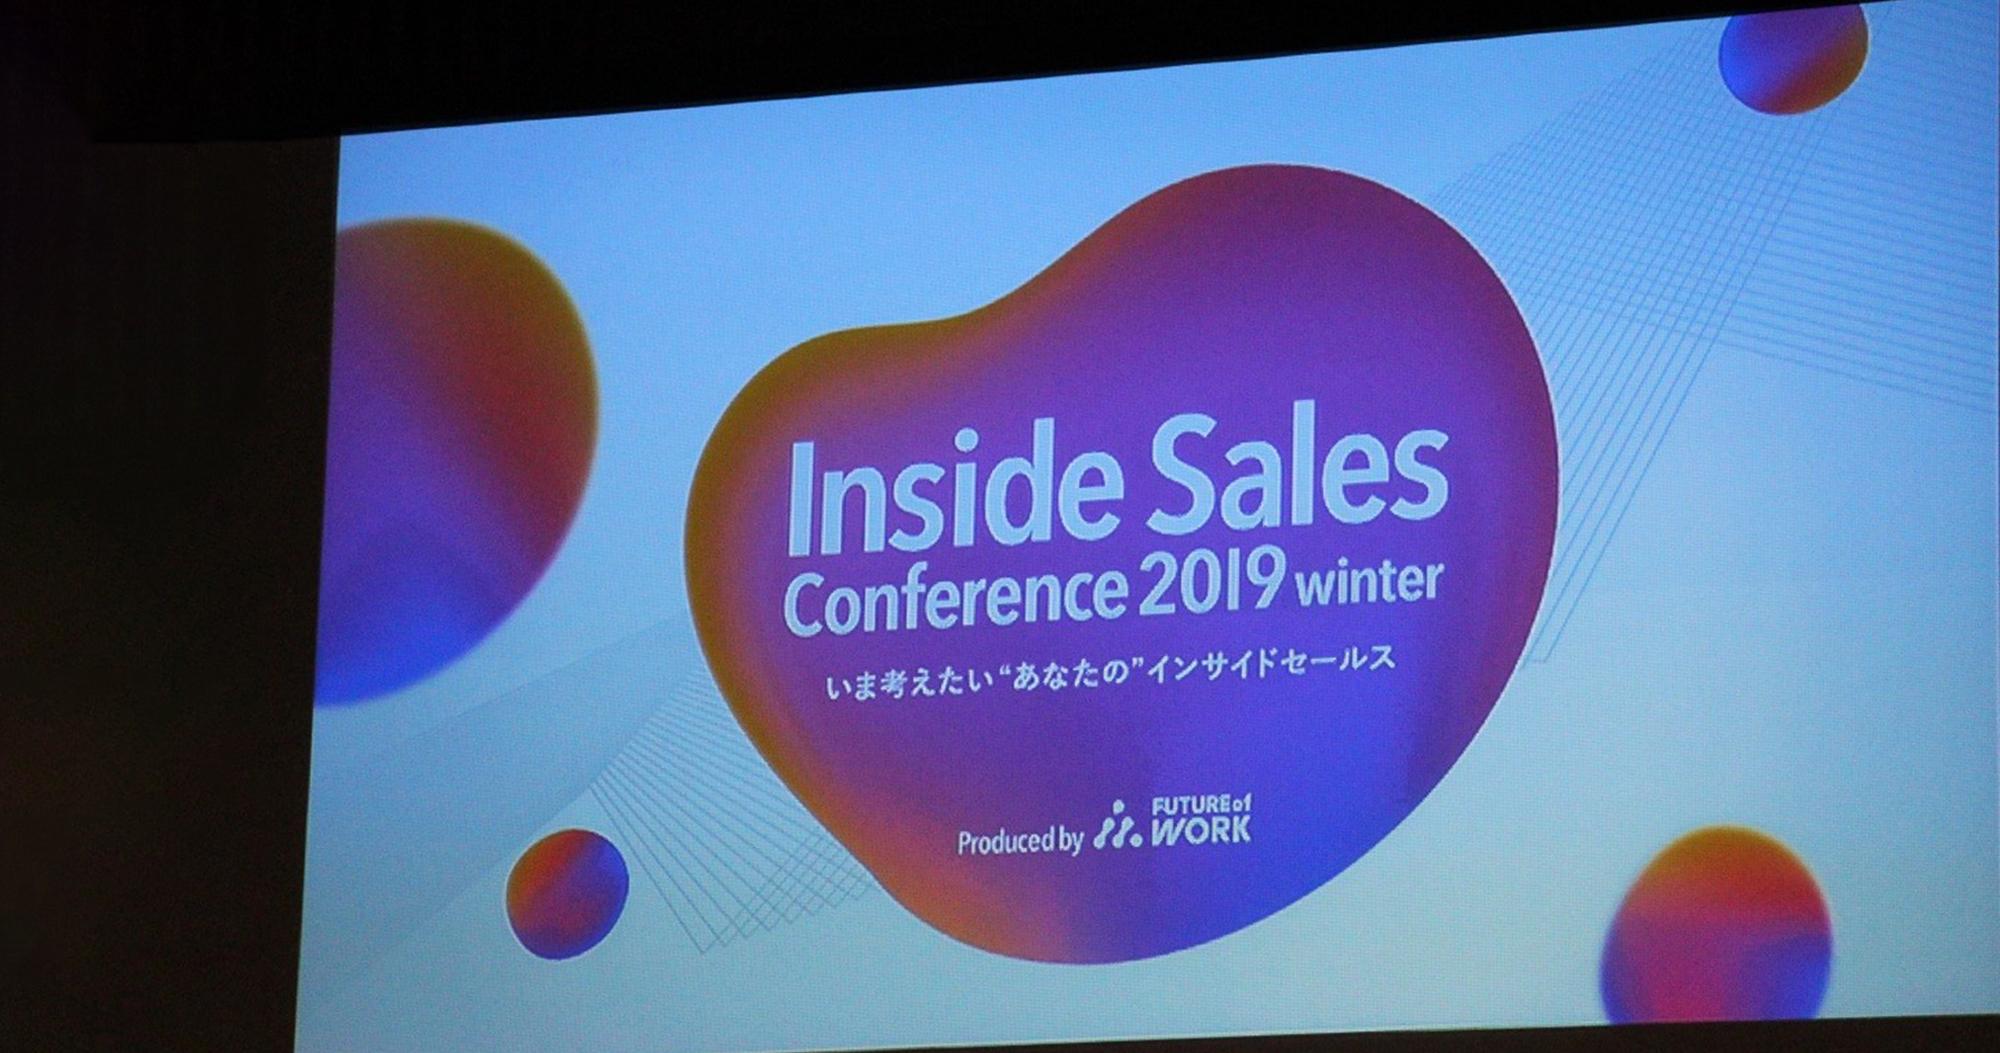 「Google Cloud Next '19 in Tokyo」レポート 第二回 セッション:Google Cloud Search  Googleの検索技術でビジネス革新